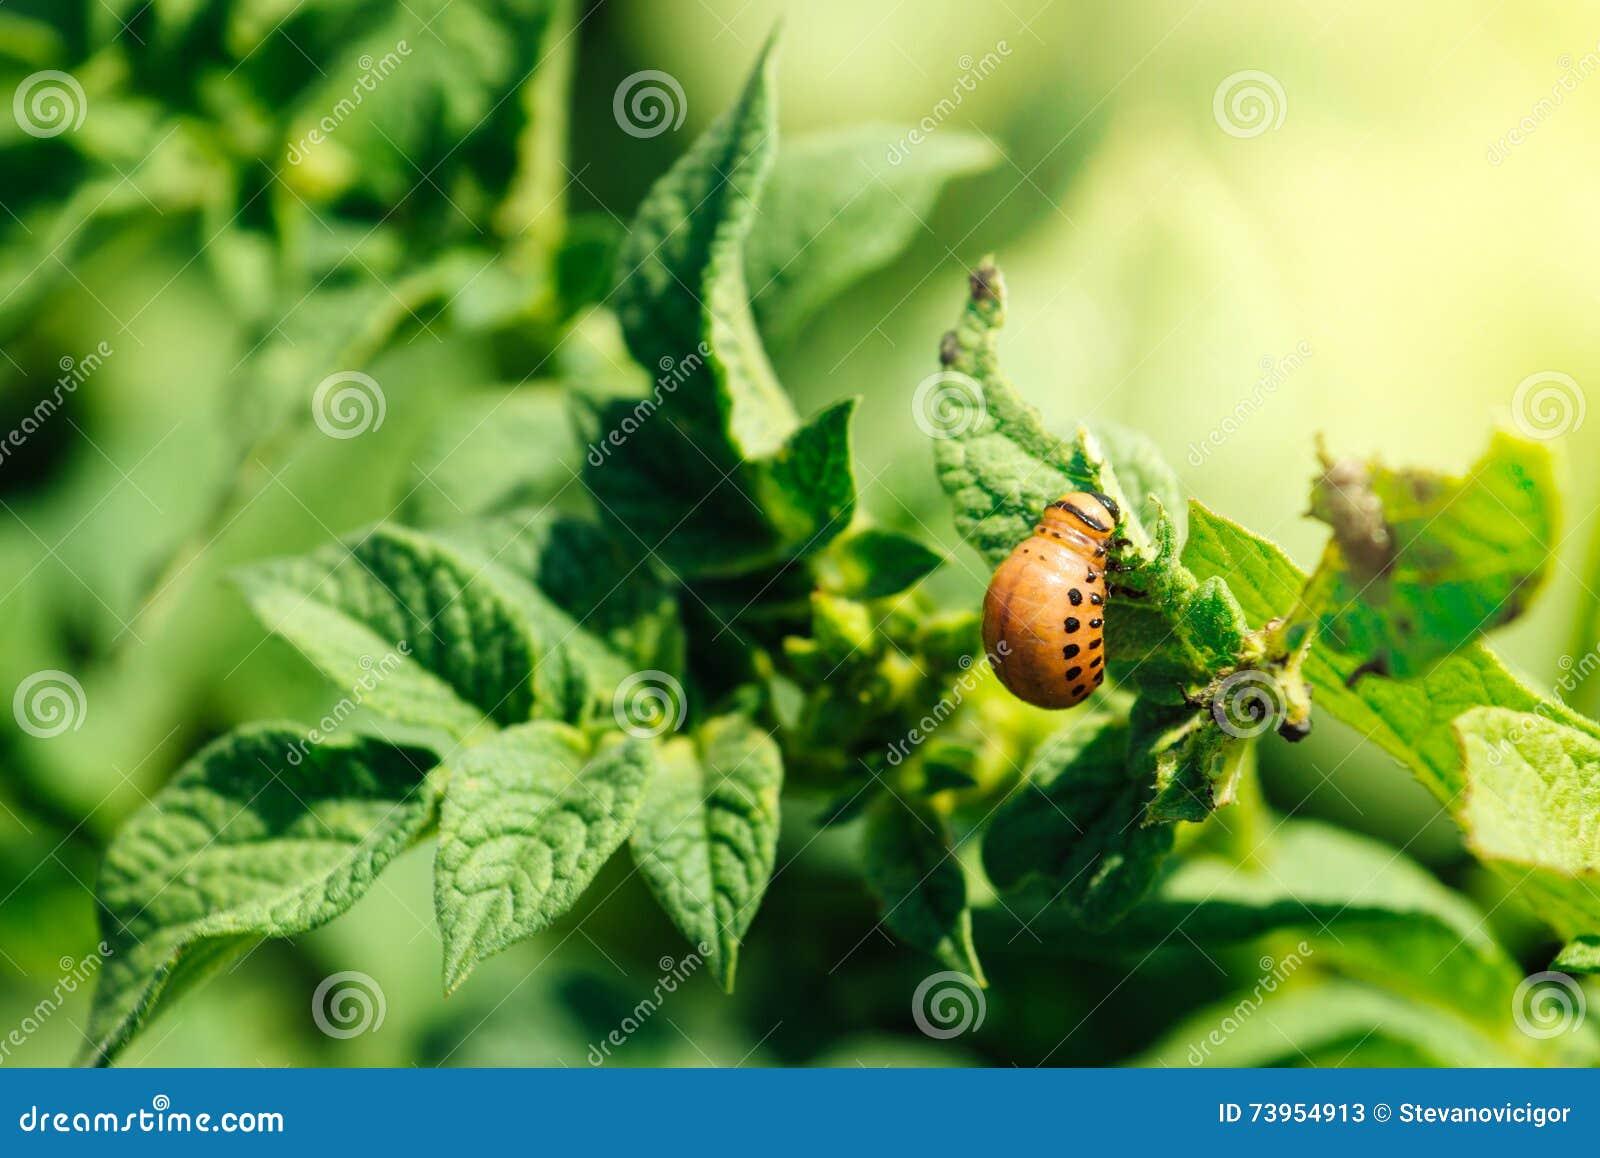 Potato bug larvae feeding on a plant leaf